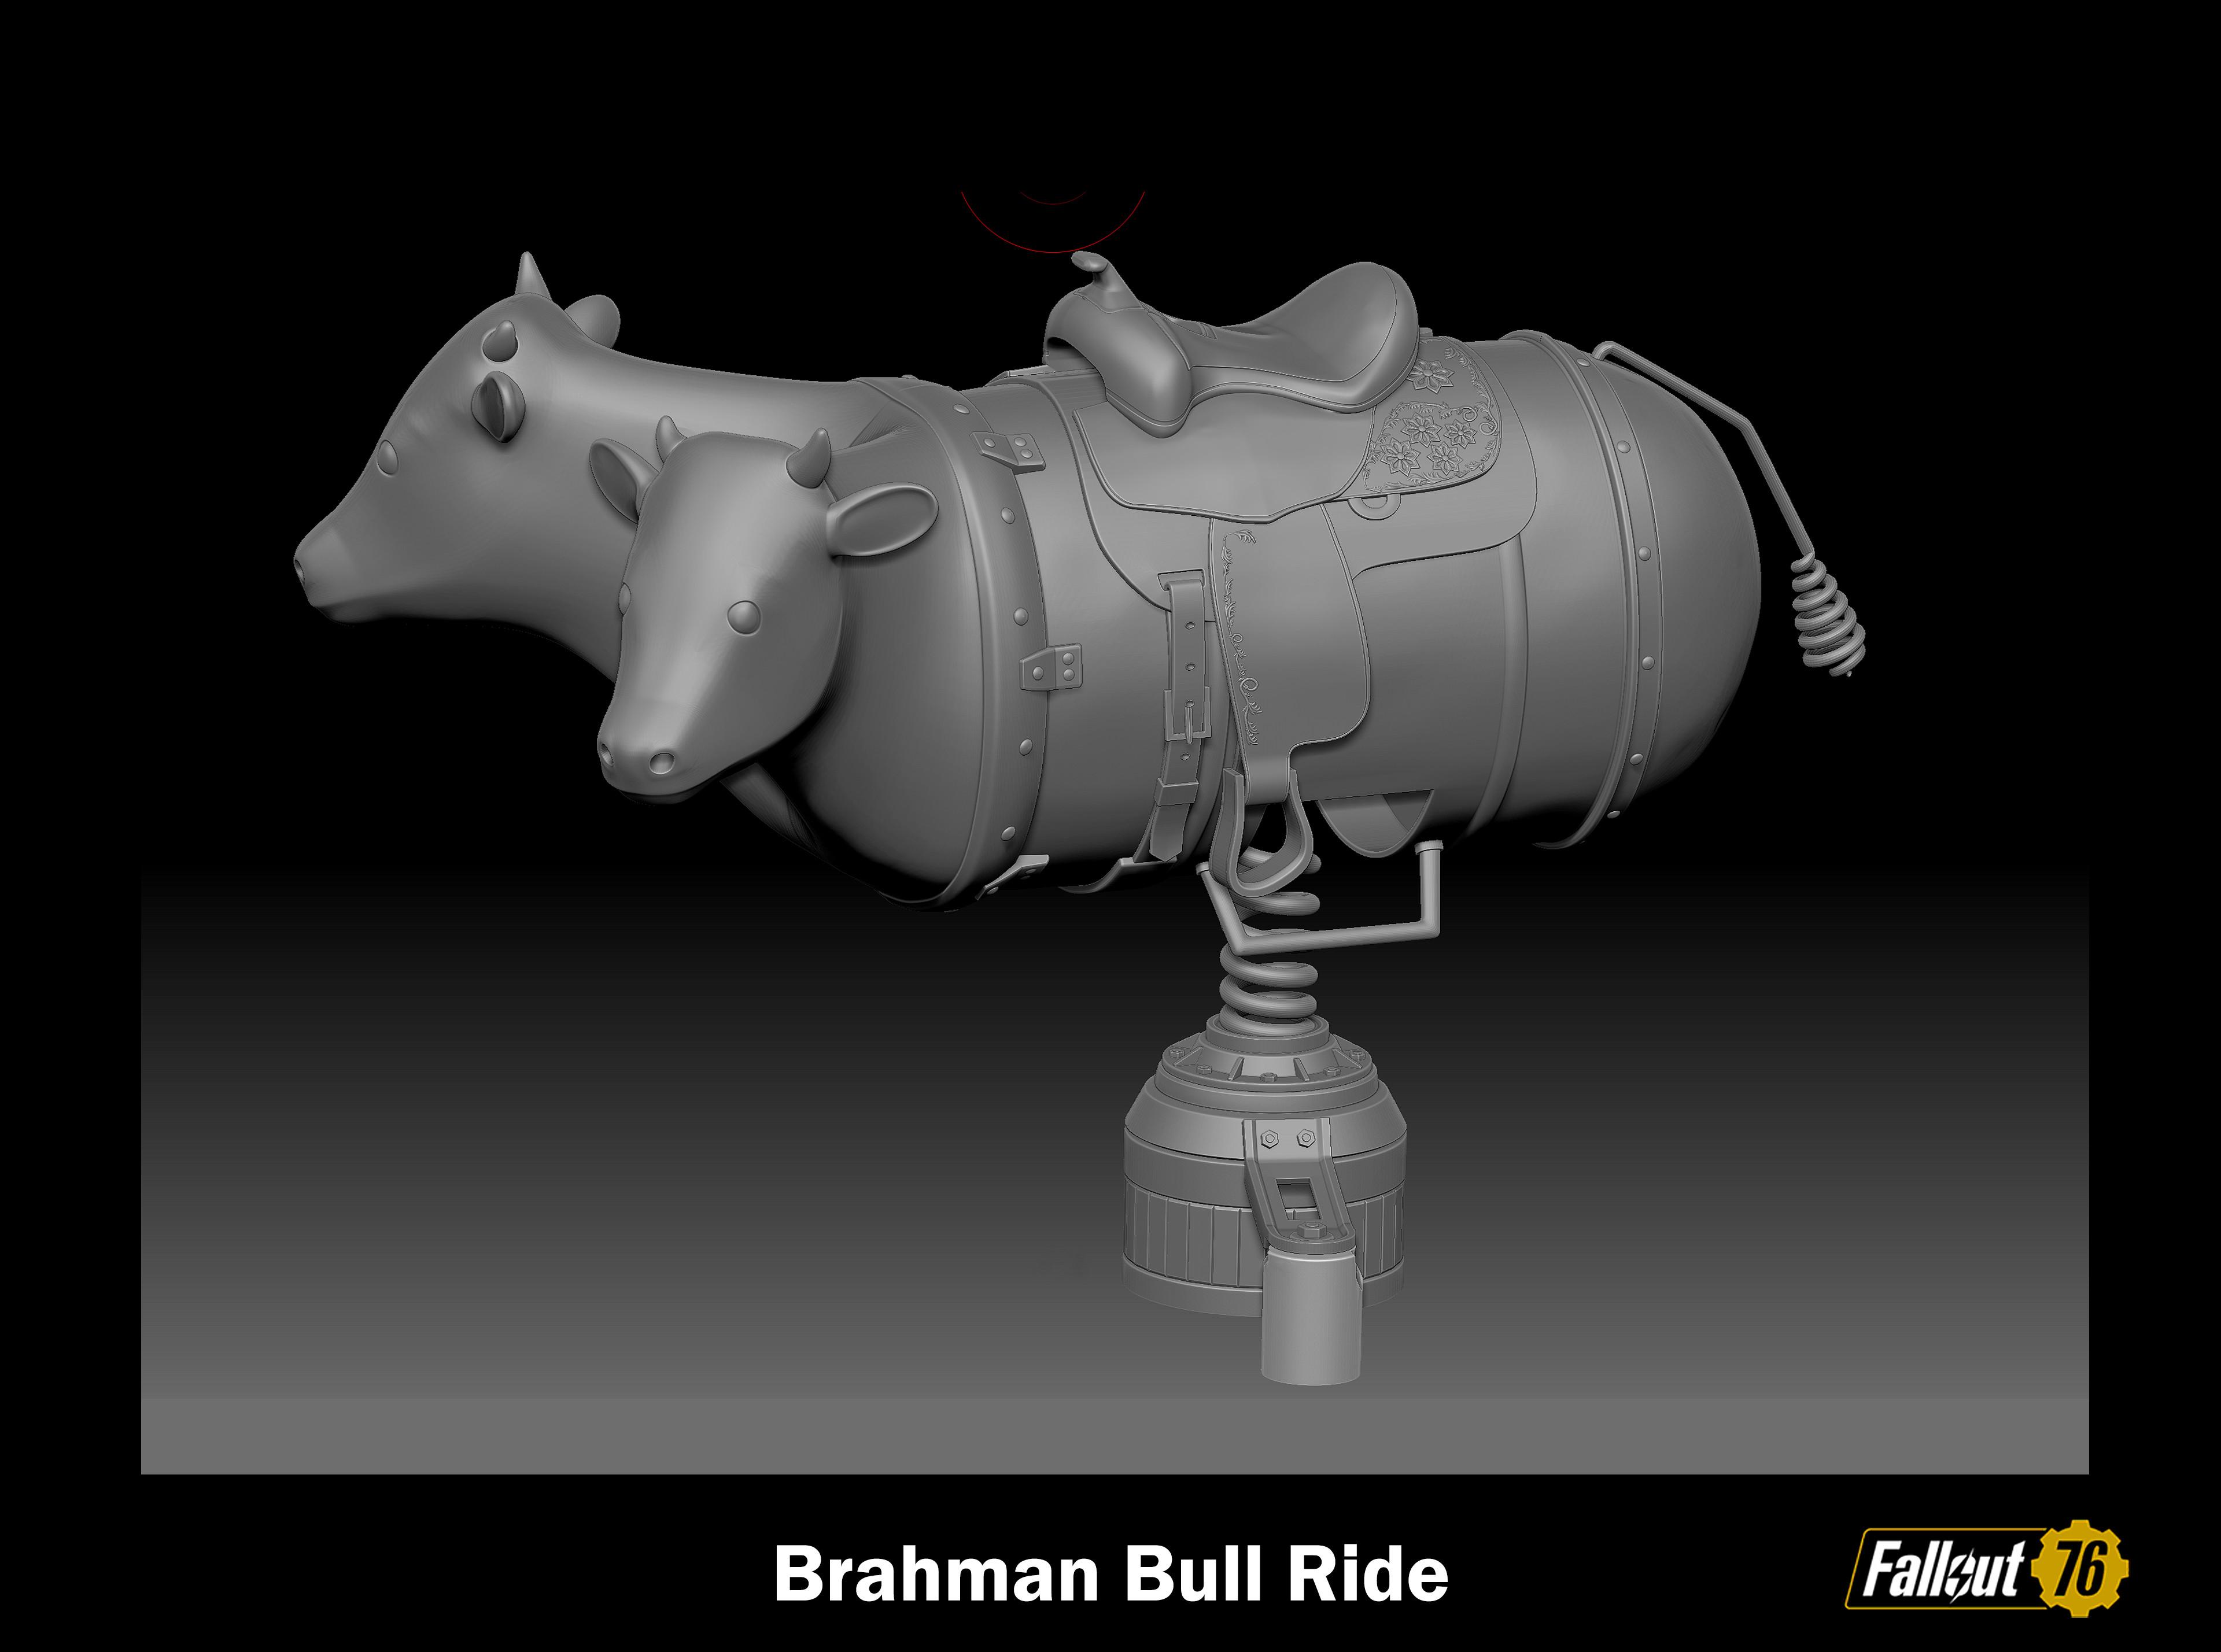 Brahman Bull high resolution ZBrush asset.